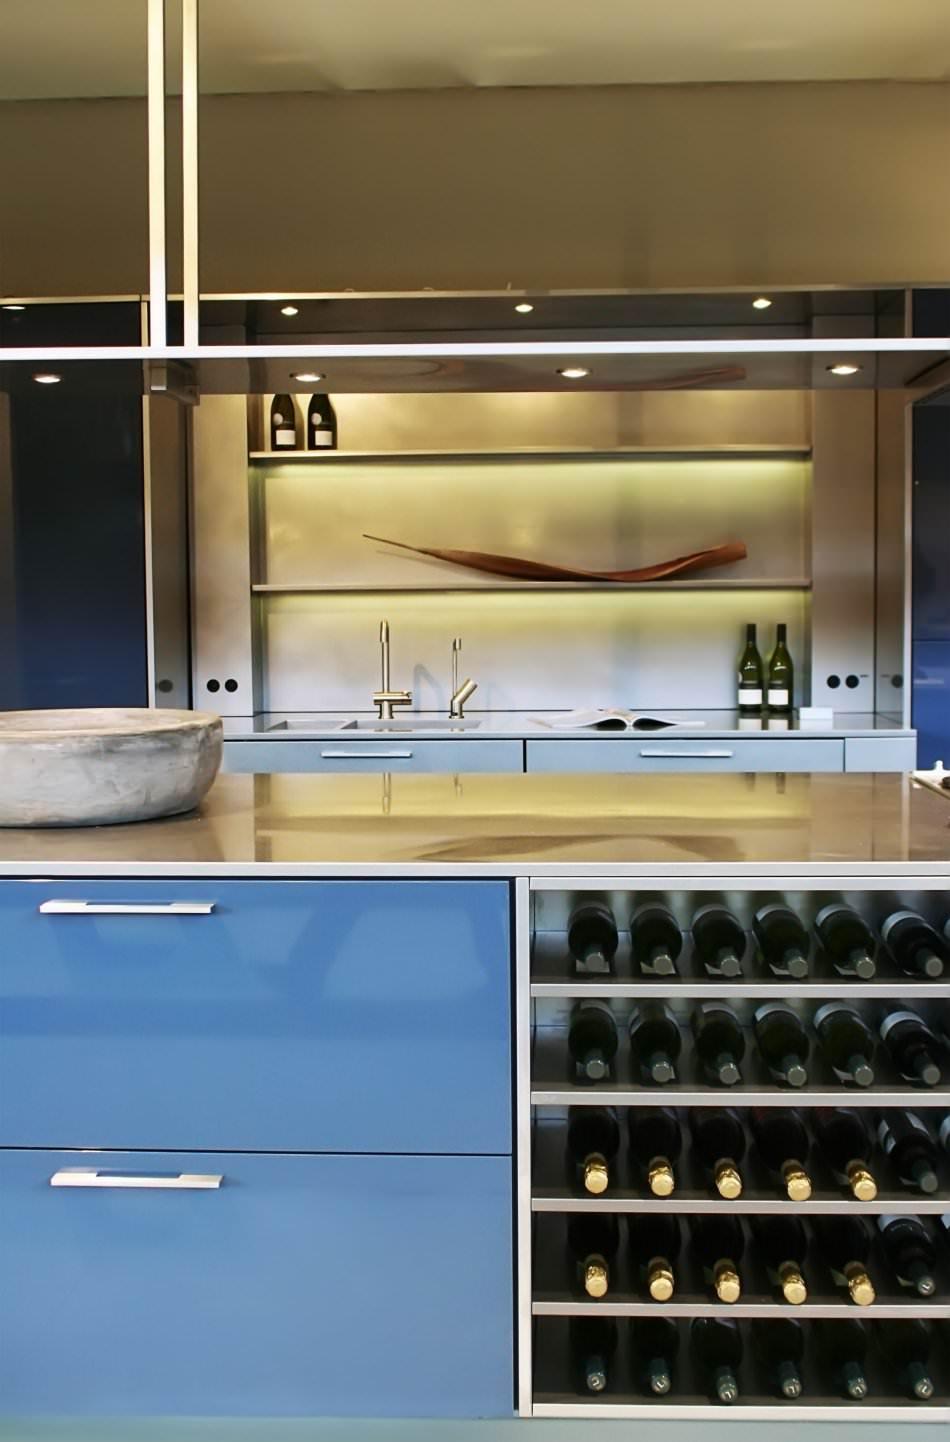 RAL 5012 Light Blue High Gloss Kitchen Cabinets